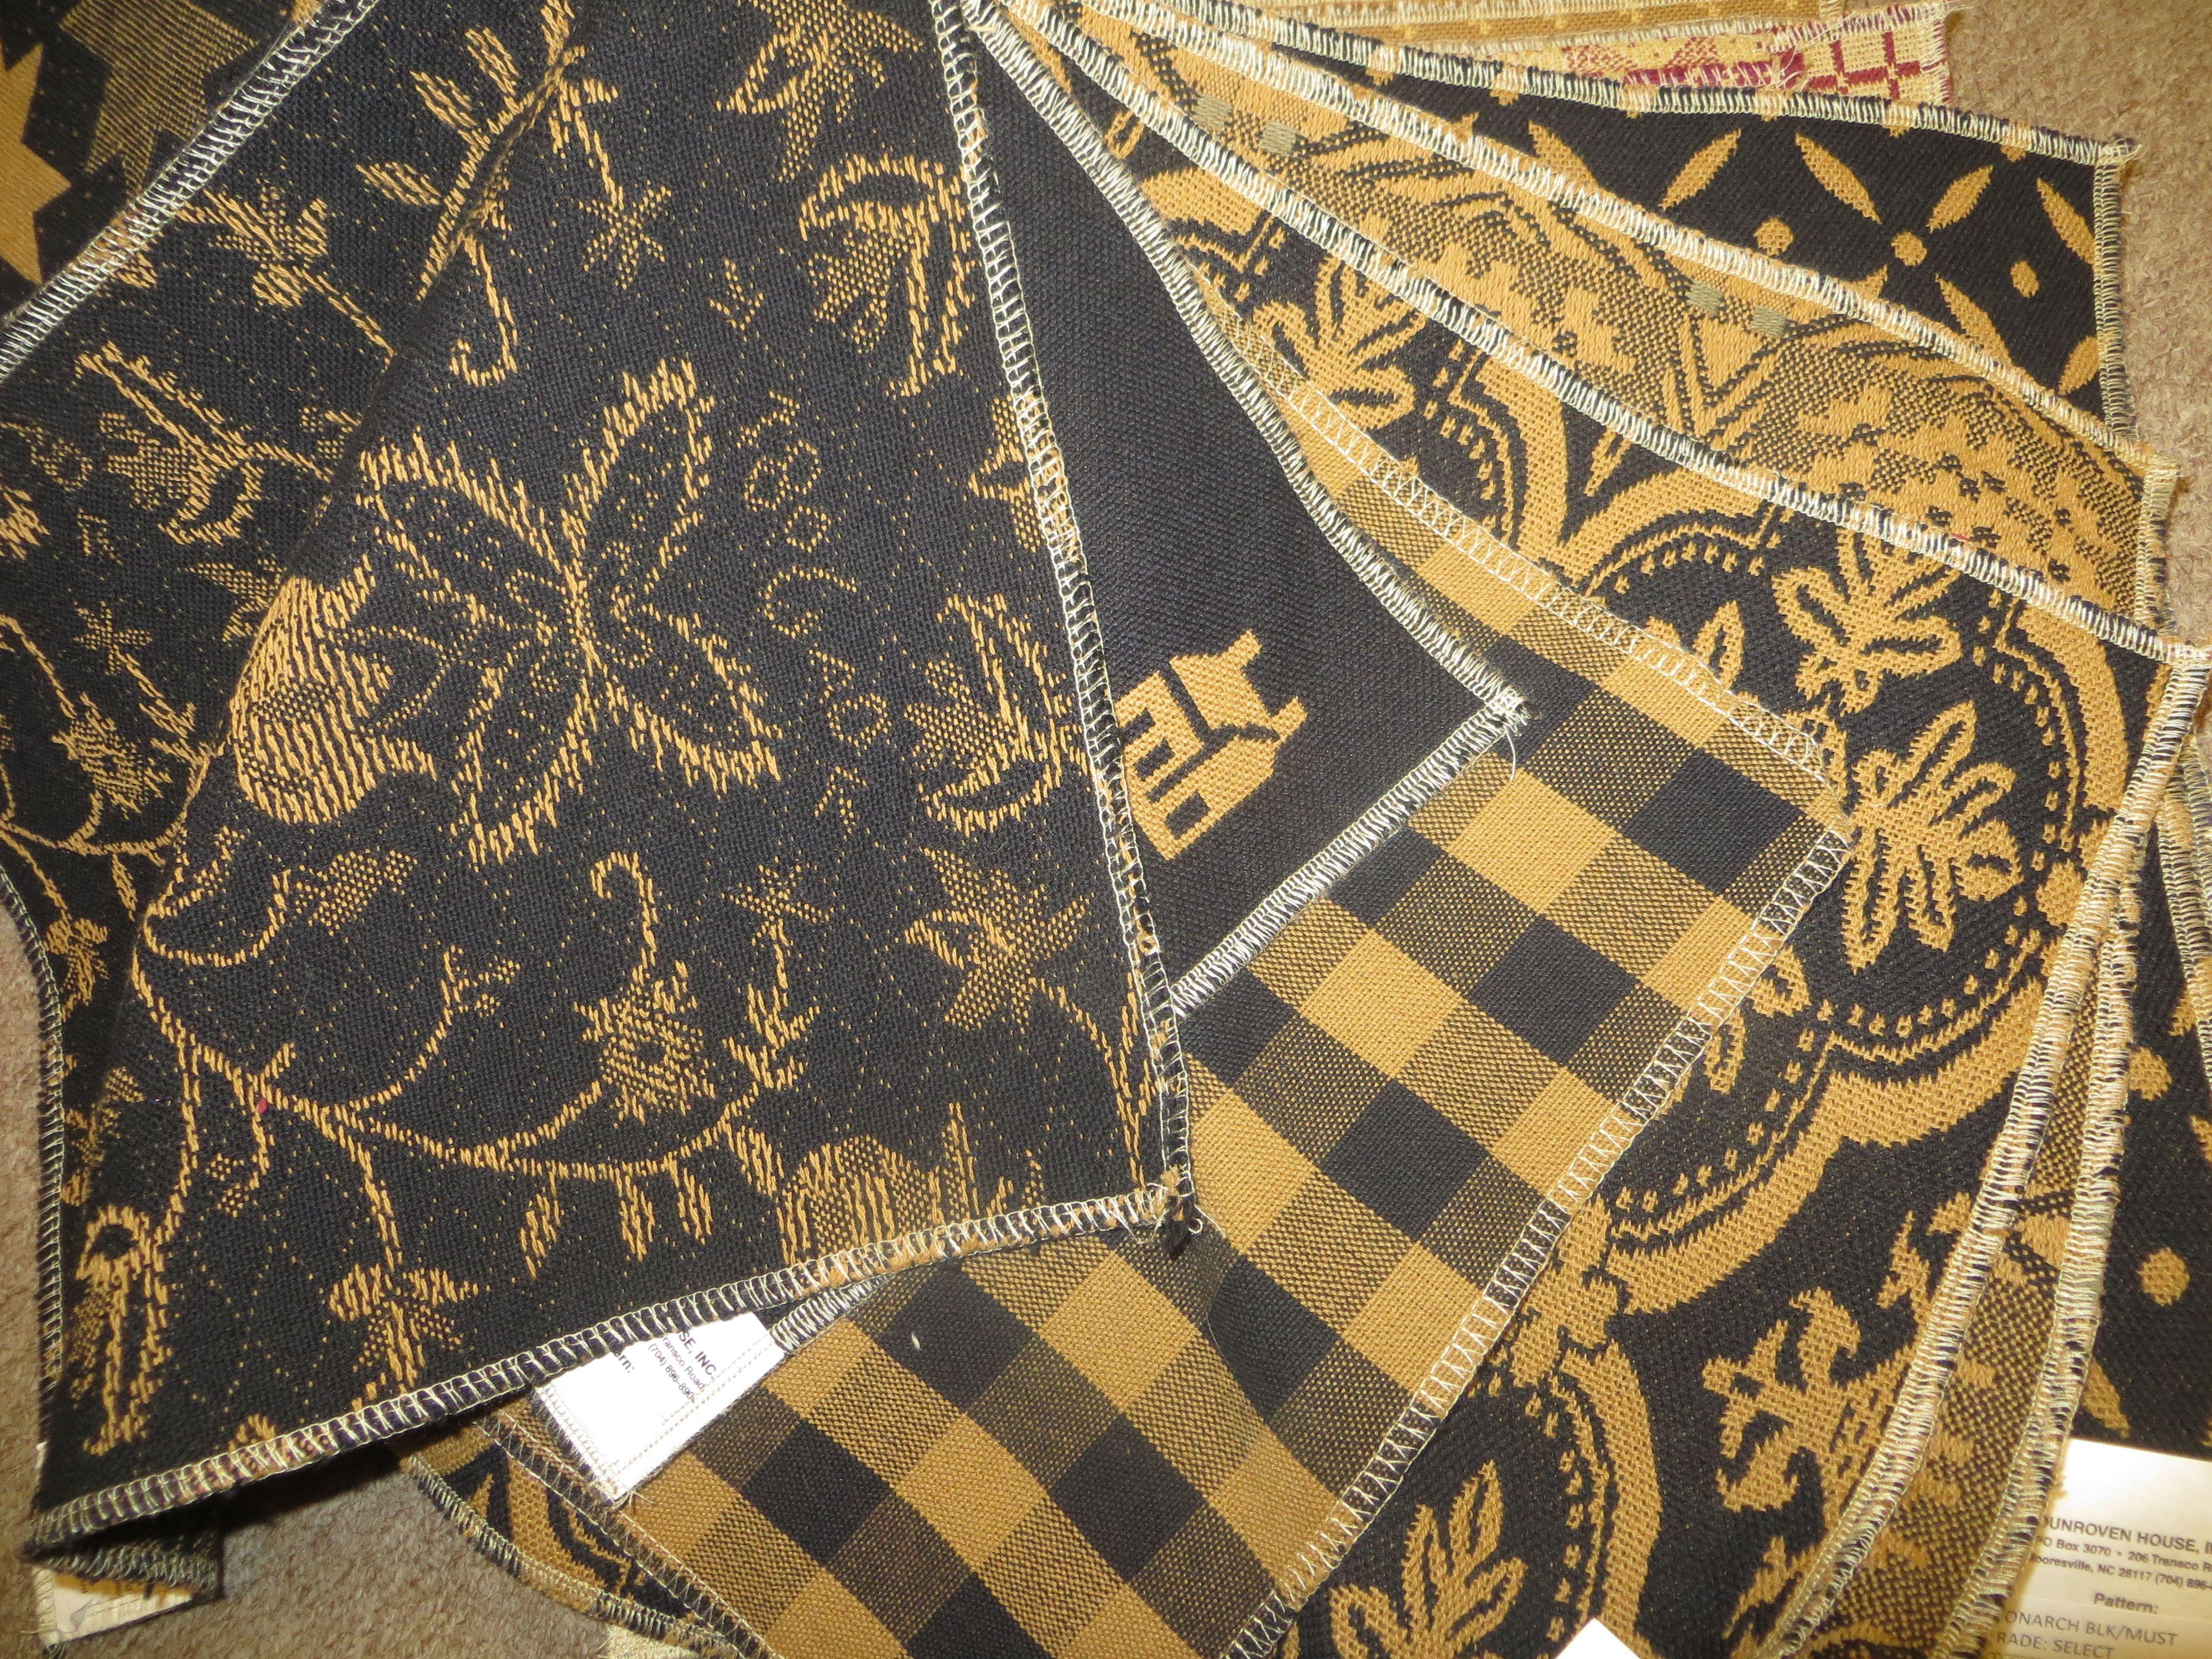 Upholstery fabric geometric design fabric home decor aqua blue - Black Mustard Upholstery Fabric Www Theredbrickcottage Com